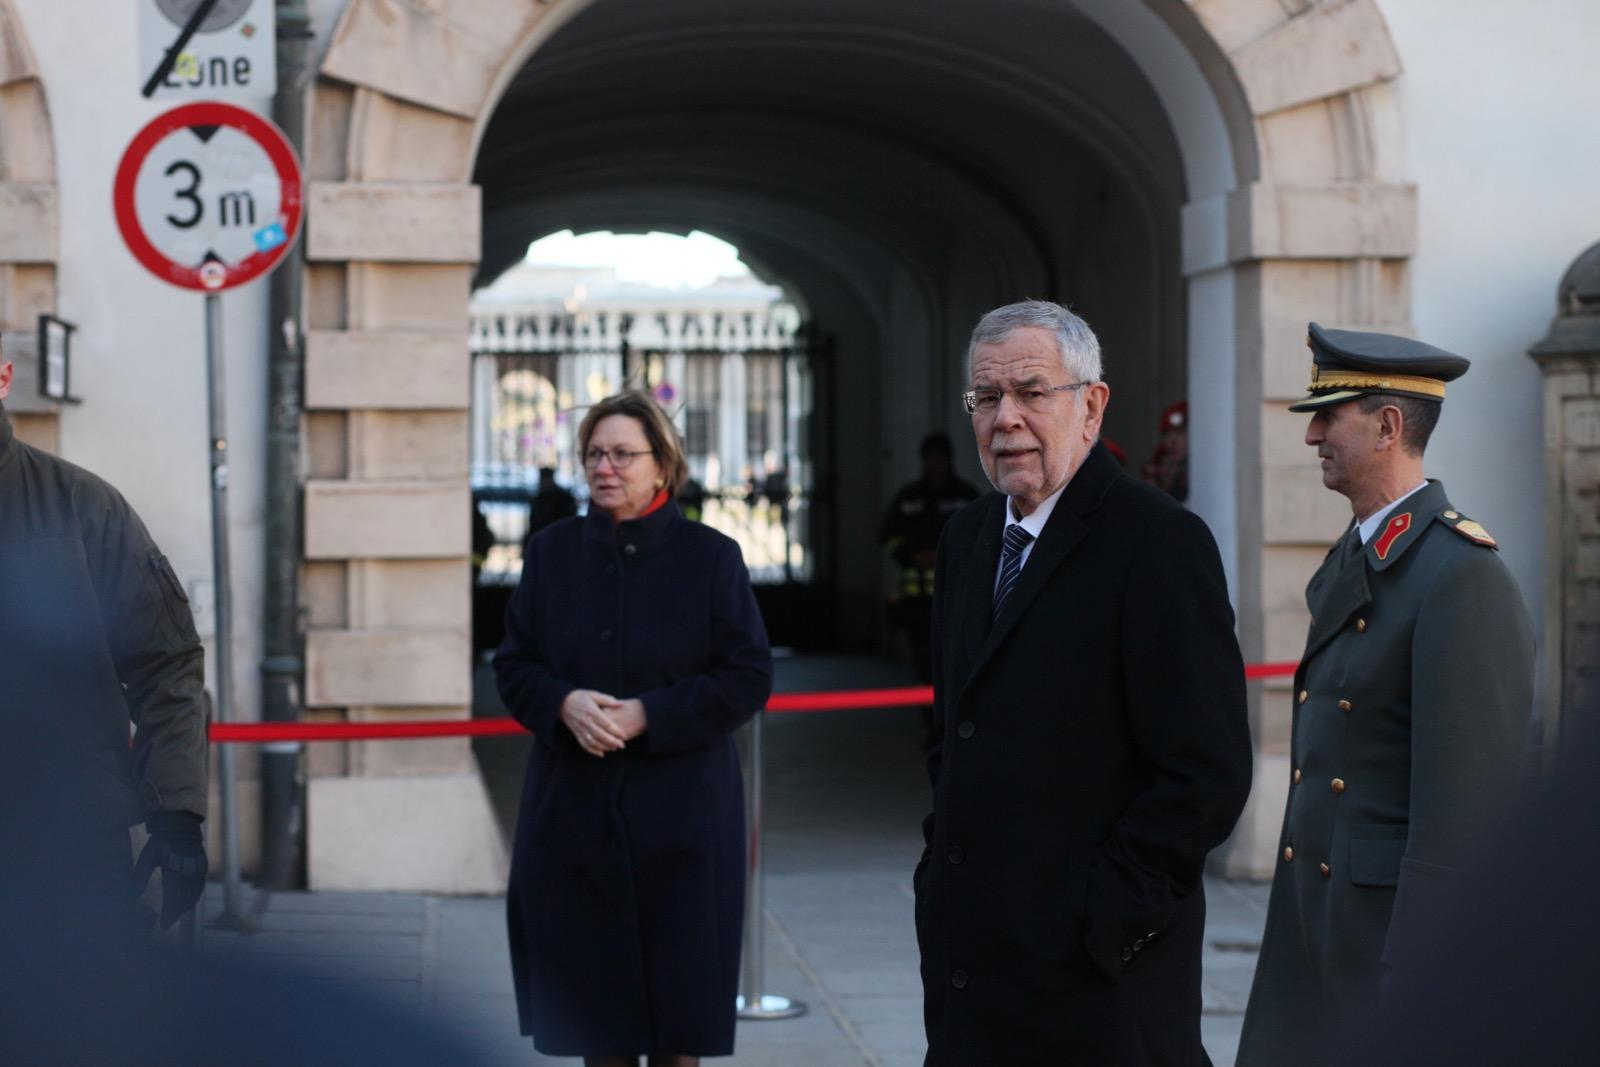 2019_01_11_1Gardekompanie_HBP_SUI_Präsident_Schweiz_Burghof - 6 of 36